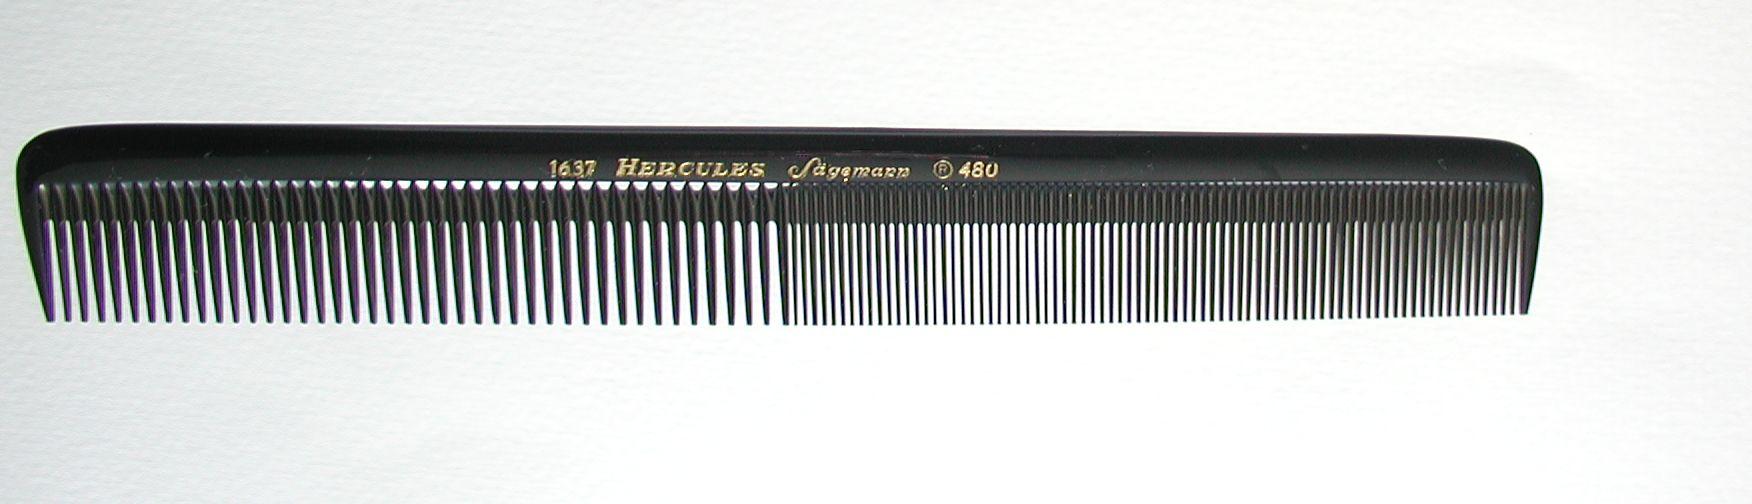 Hercules Sägemann 1637/480 Universalkamm 8,5''